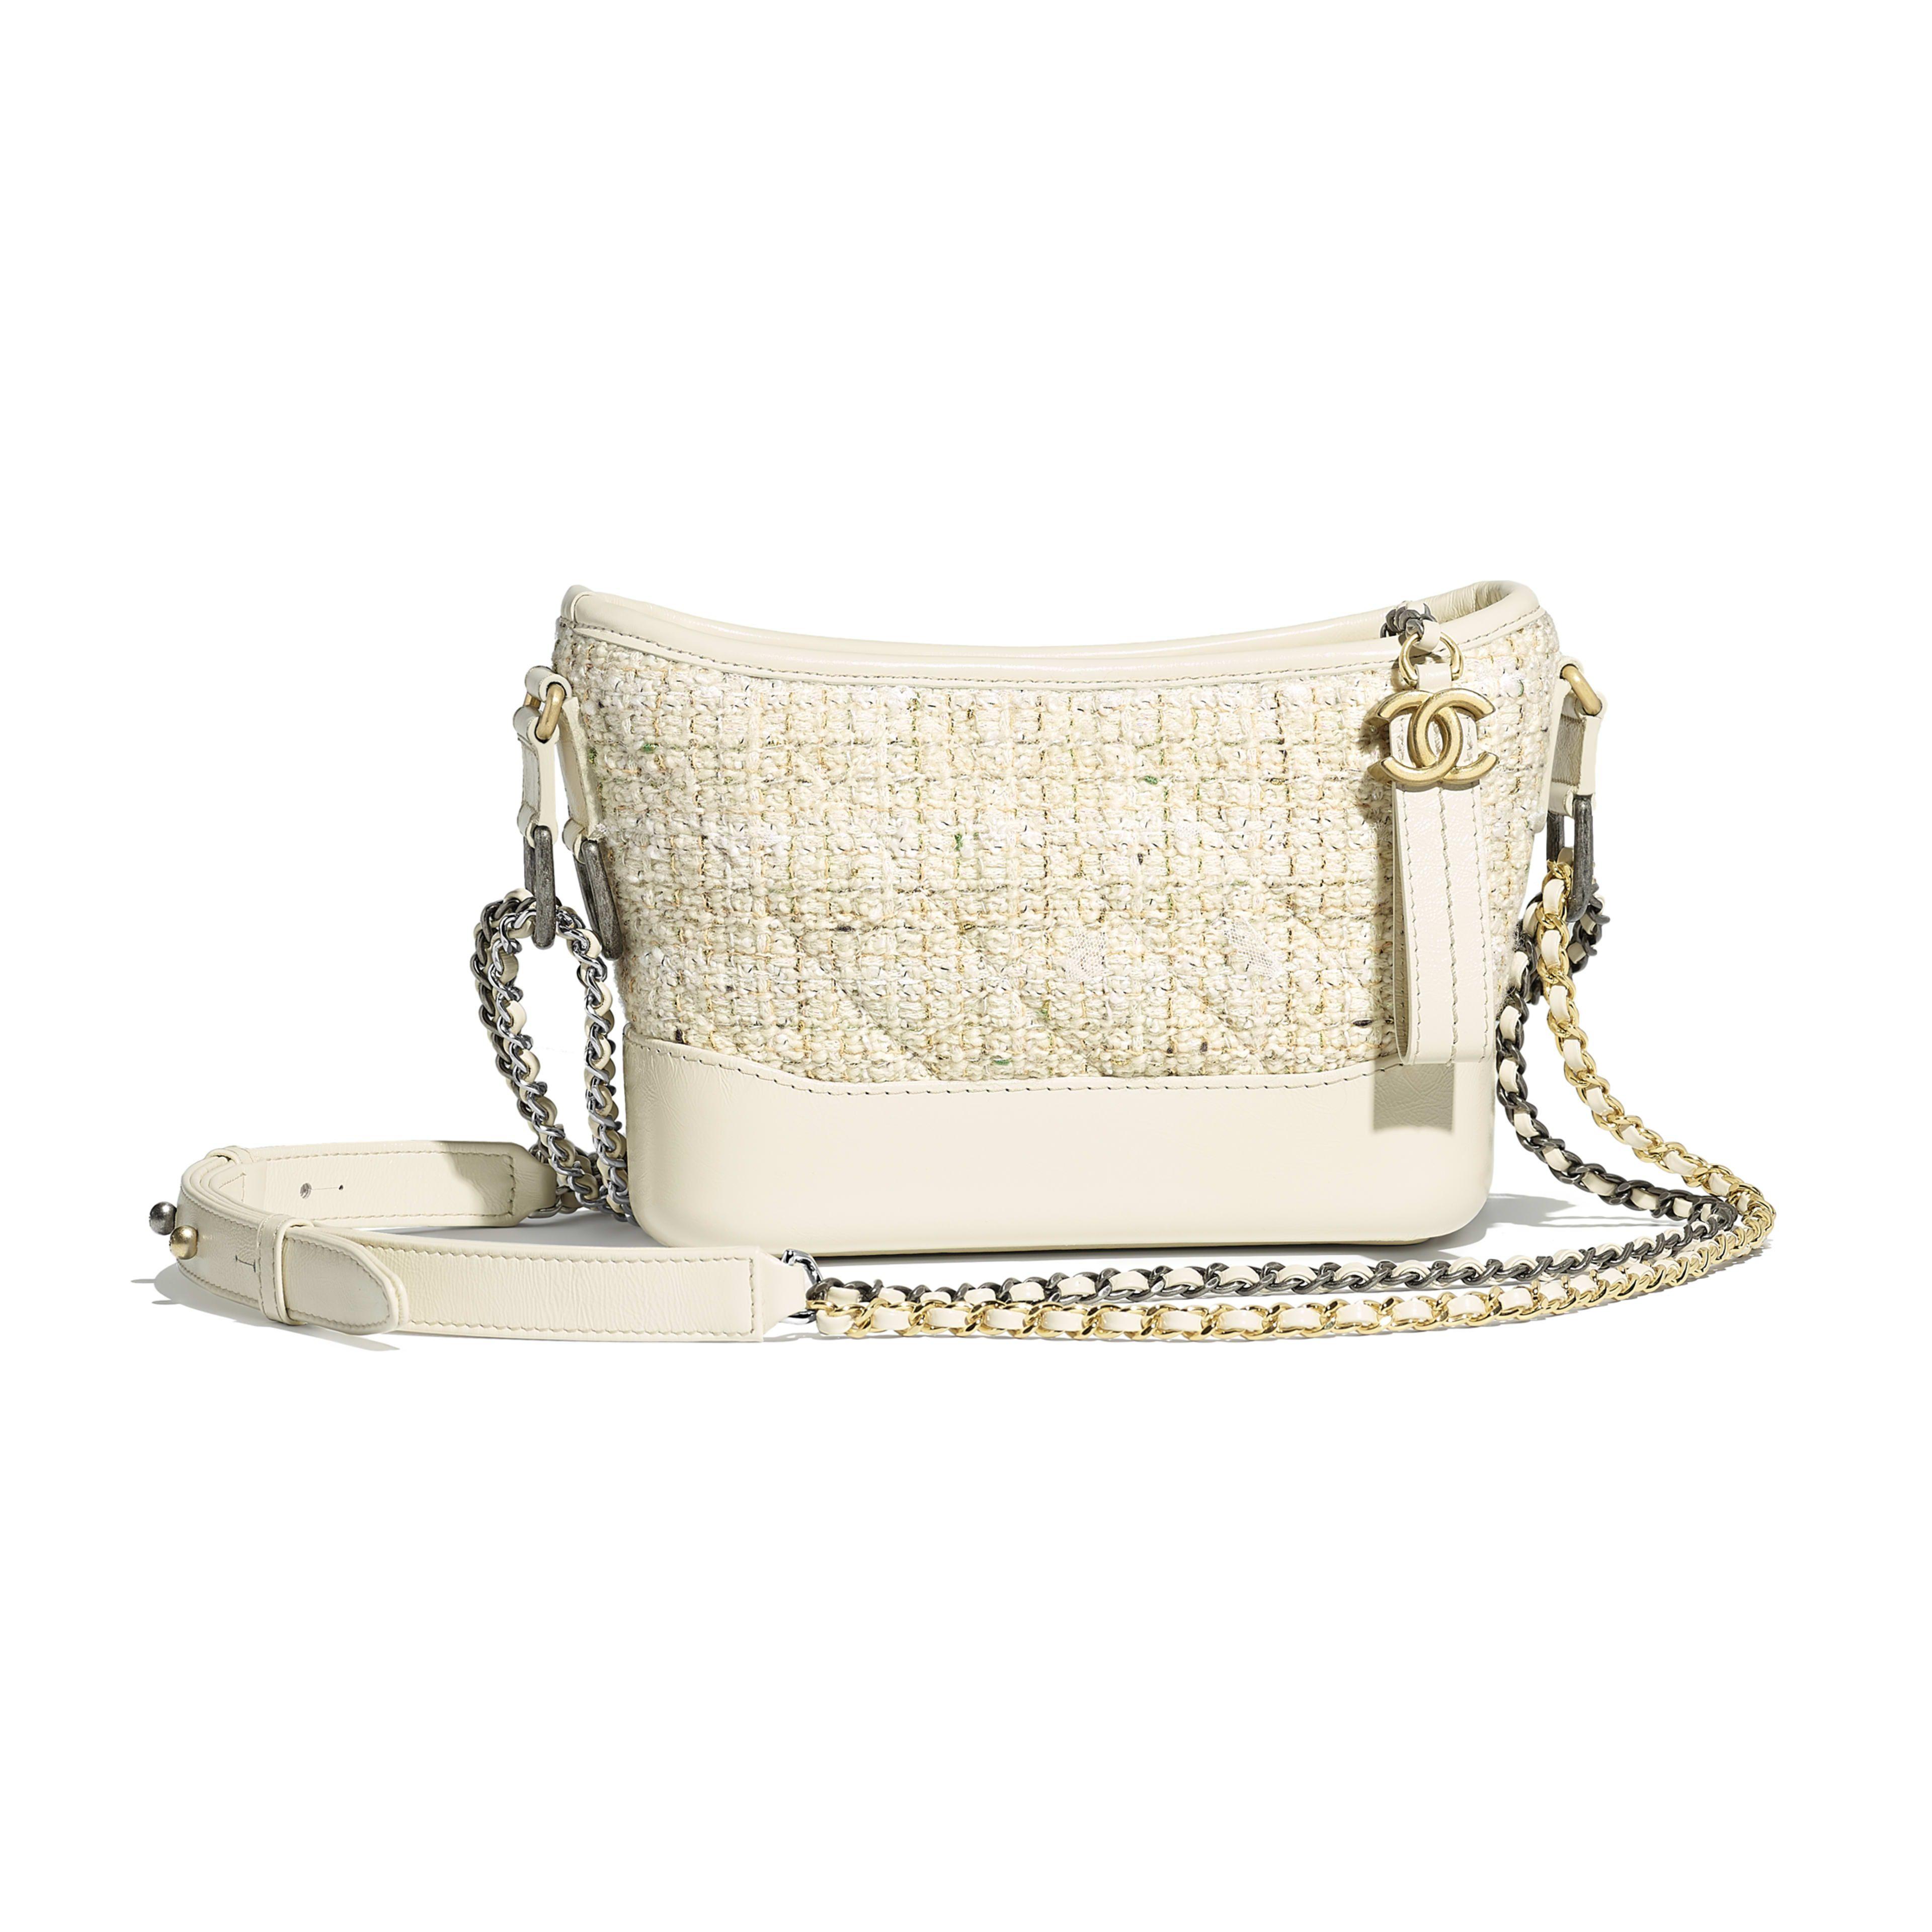 bb094786e2cc CHANEL S GABRIELLE Small Hobo Bag Tweed